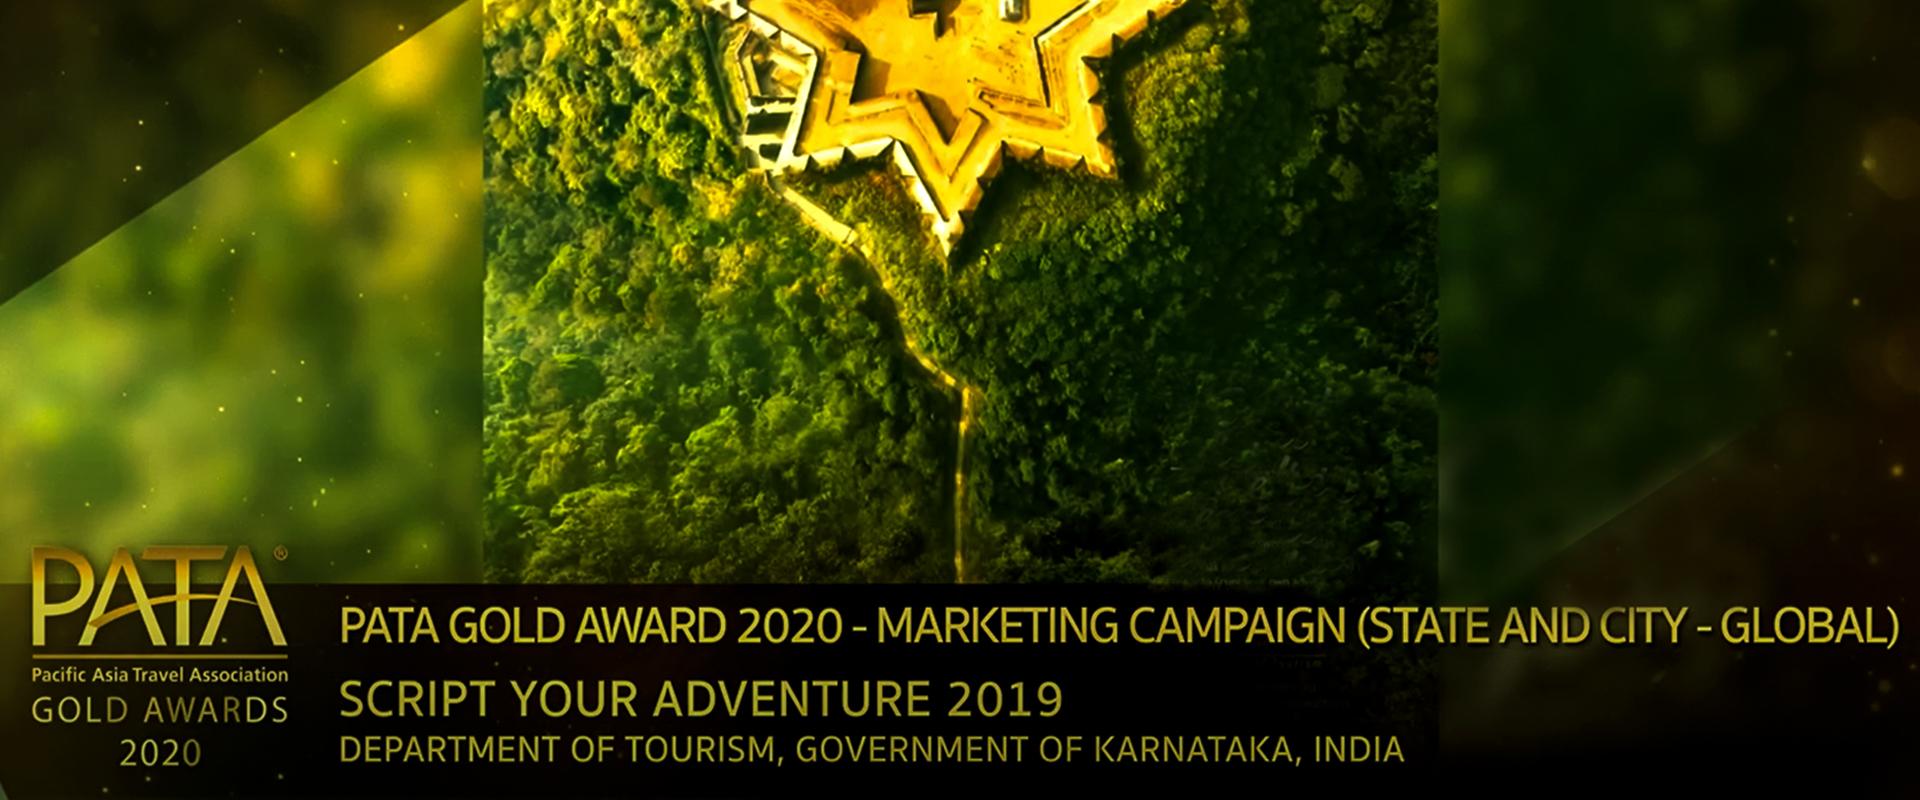 PATA Gold Award